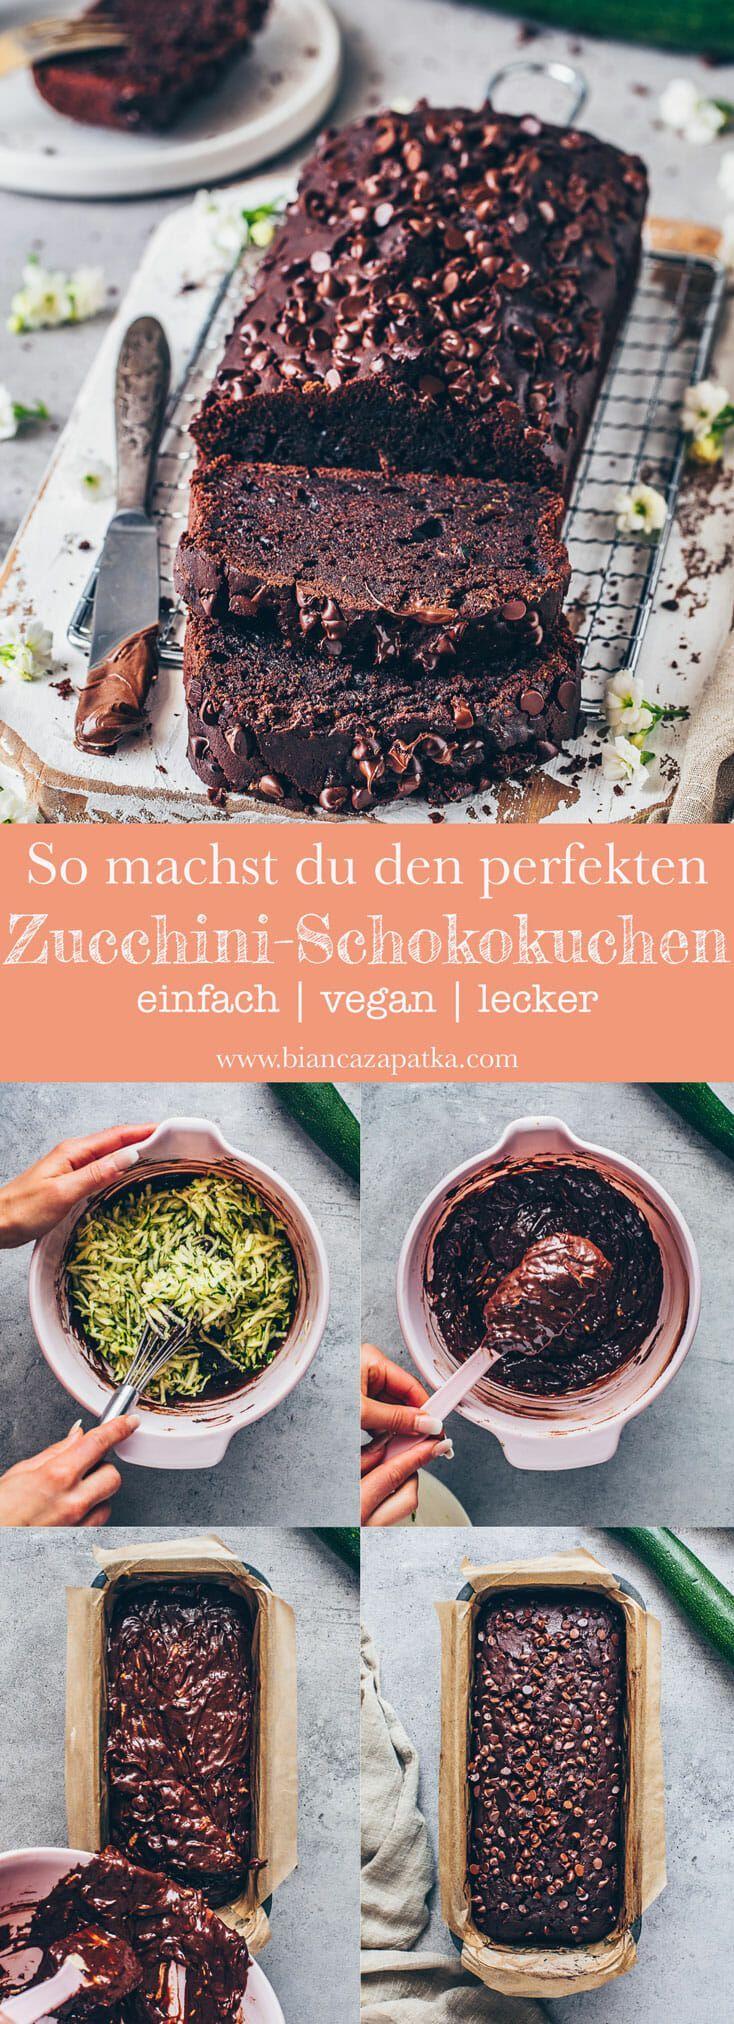 Zucchini-Schokoladenkuchen Rezept | Vegan & Einfach - Bianca Zapatka | Rezepte